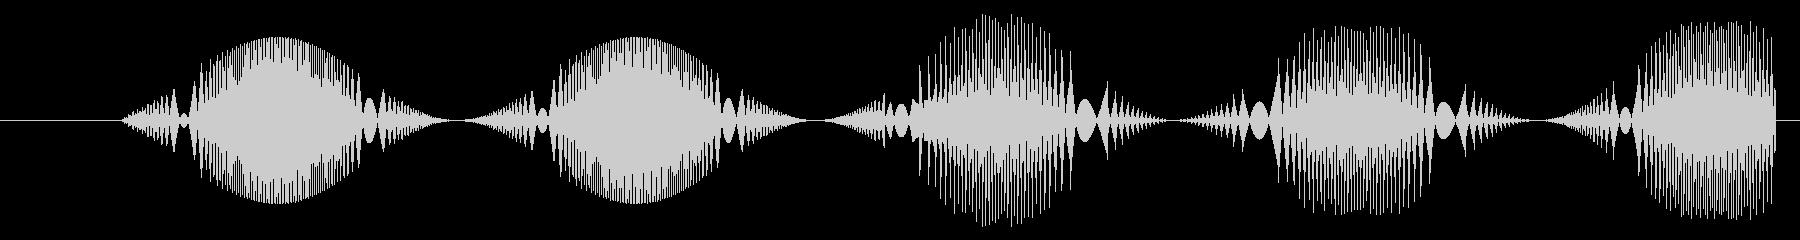 FX シンセ振動01の未再生の波形